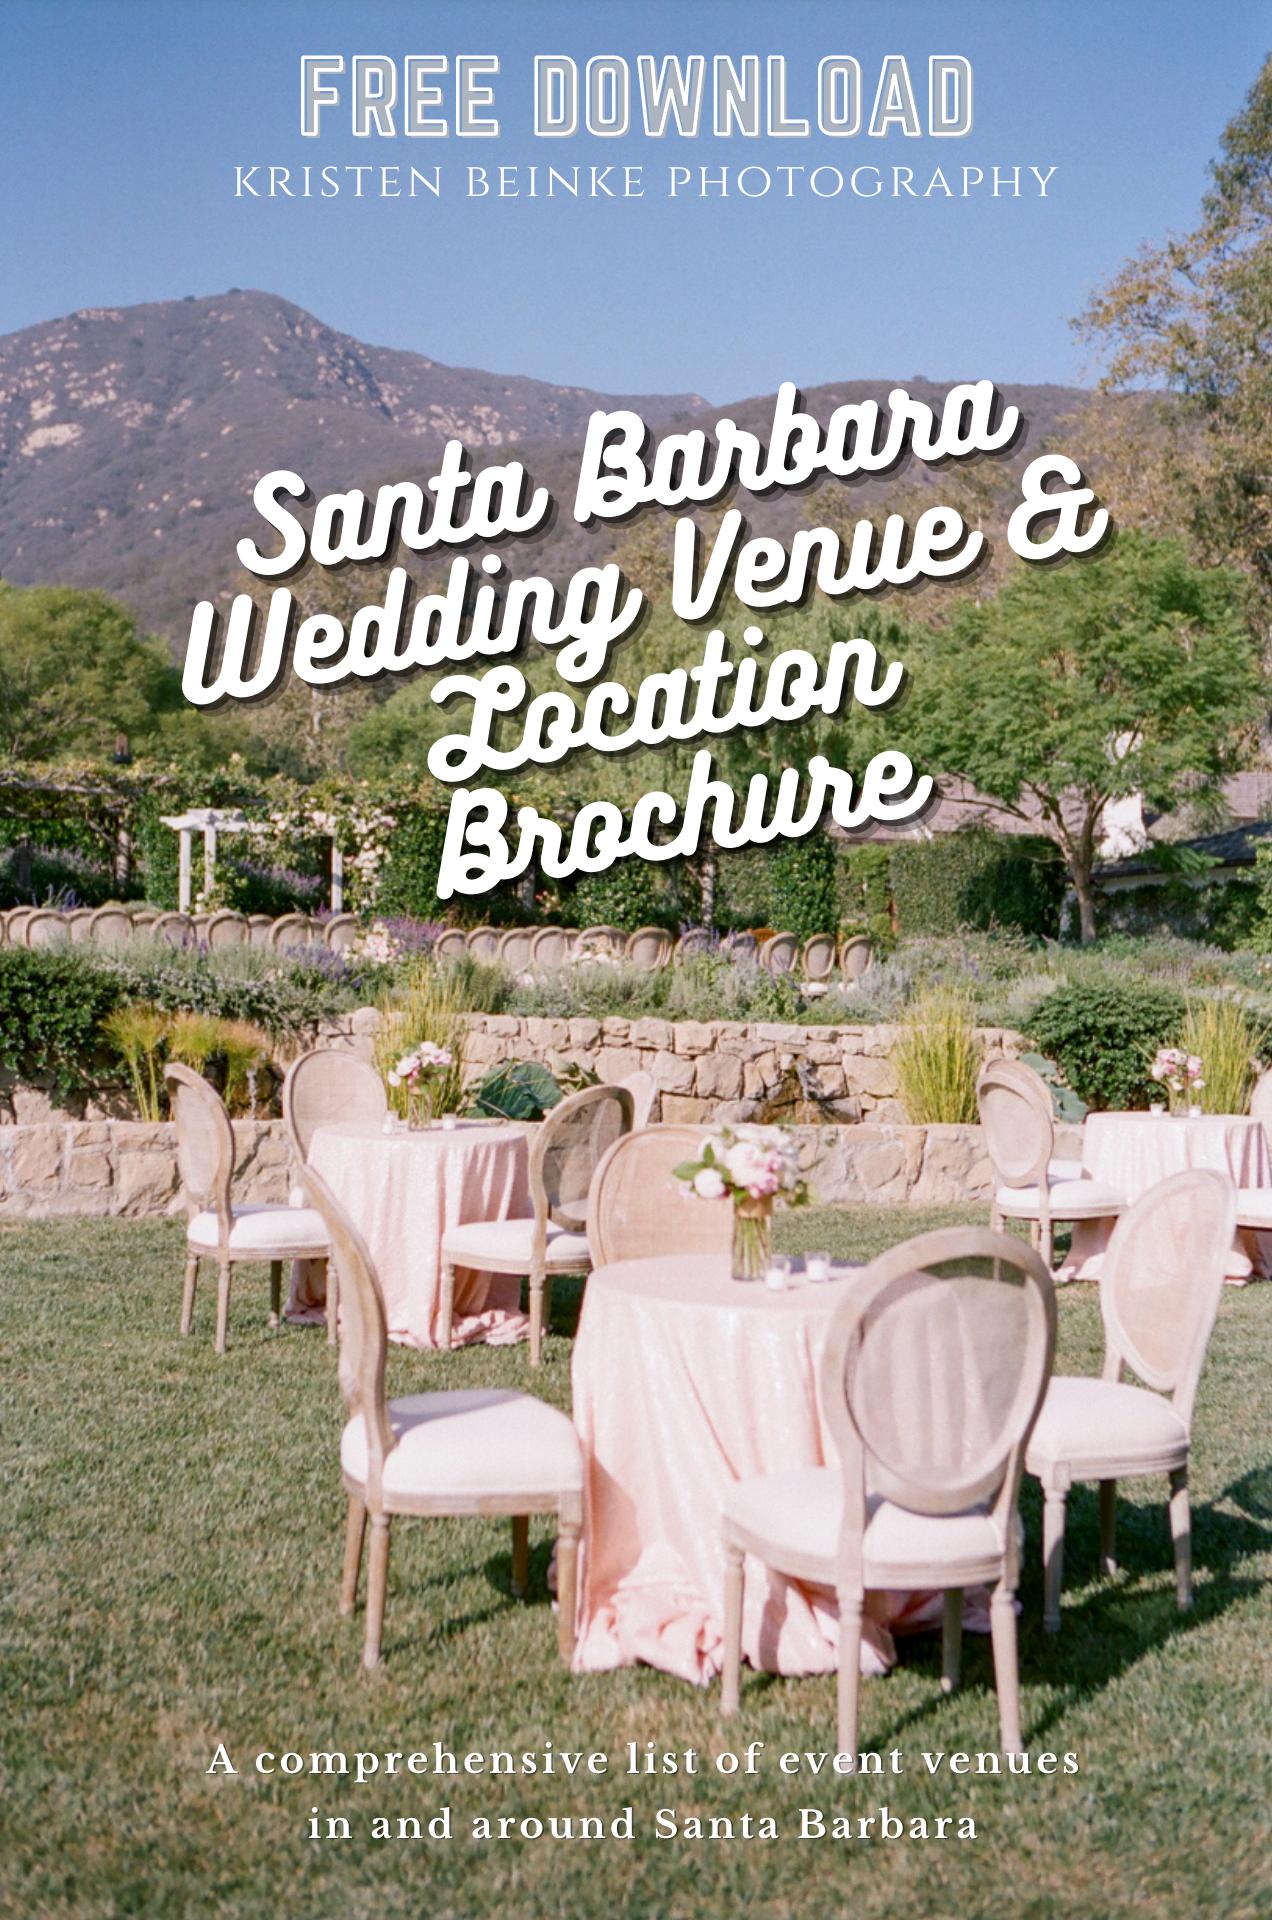 Free Wedding Venue And Location Brochure In 2020 Free Wedding Venues Santa Barbara Wedding Venue Venues